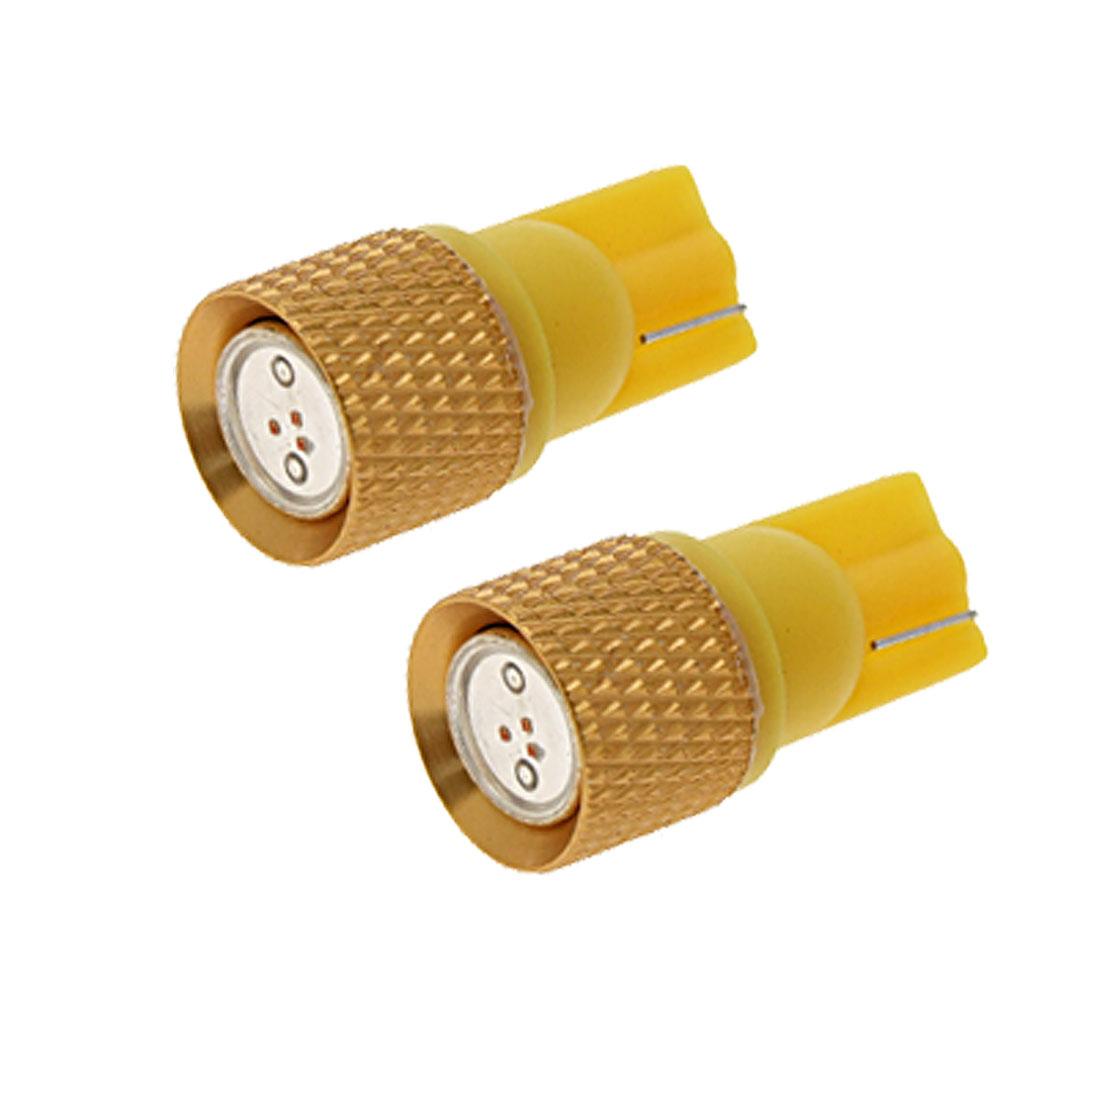 2X T10 Yellow Golden Car Auto Lamp Light Lighting Signal Bulbs 1.5W